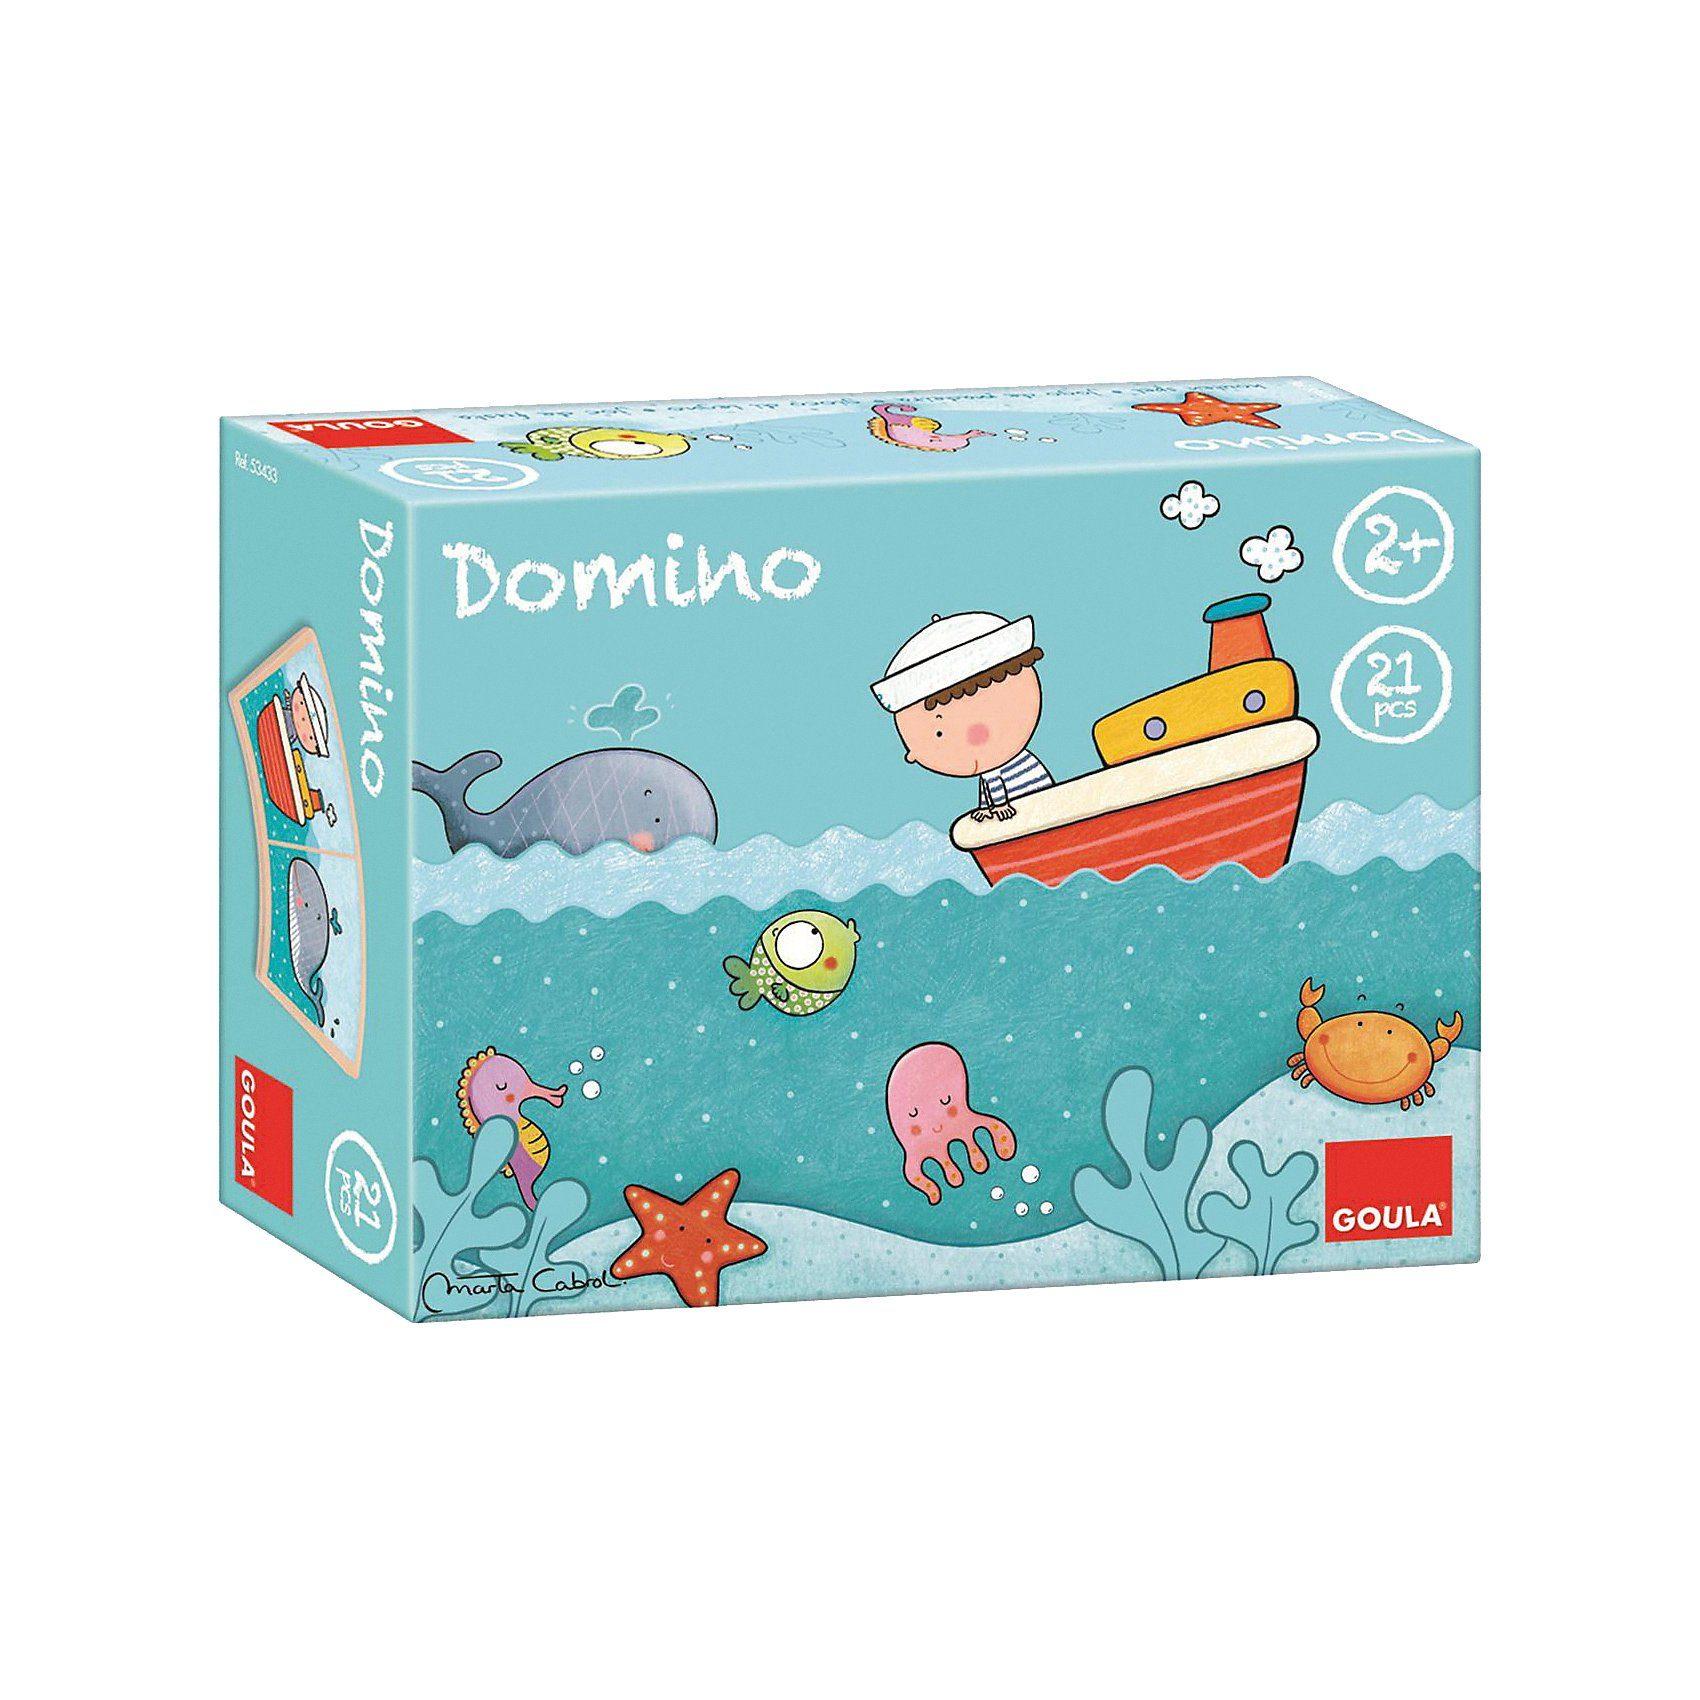 Goula Domino Oscar auf hoher See